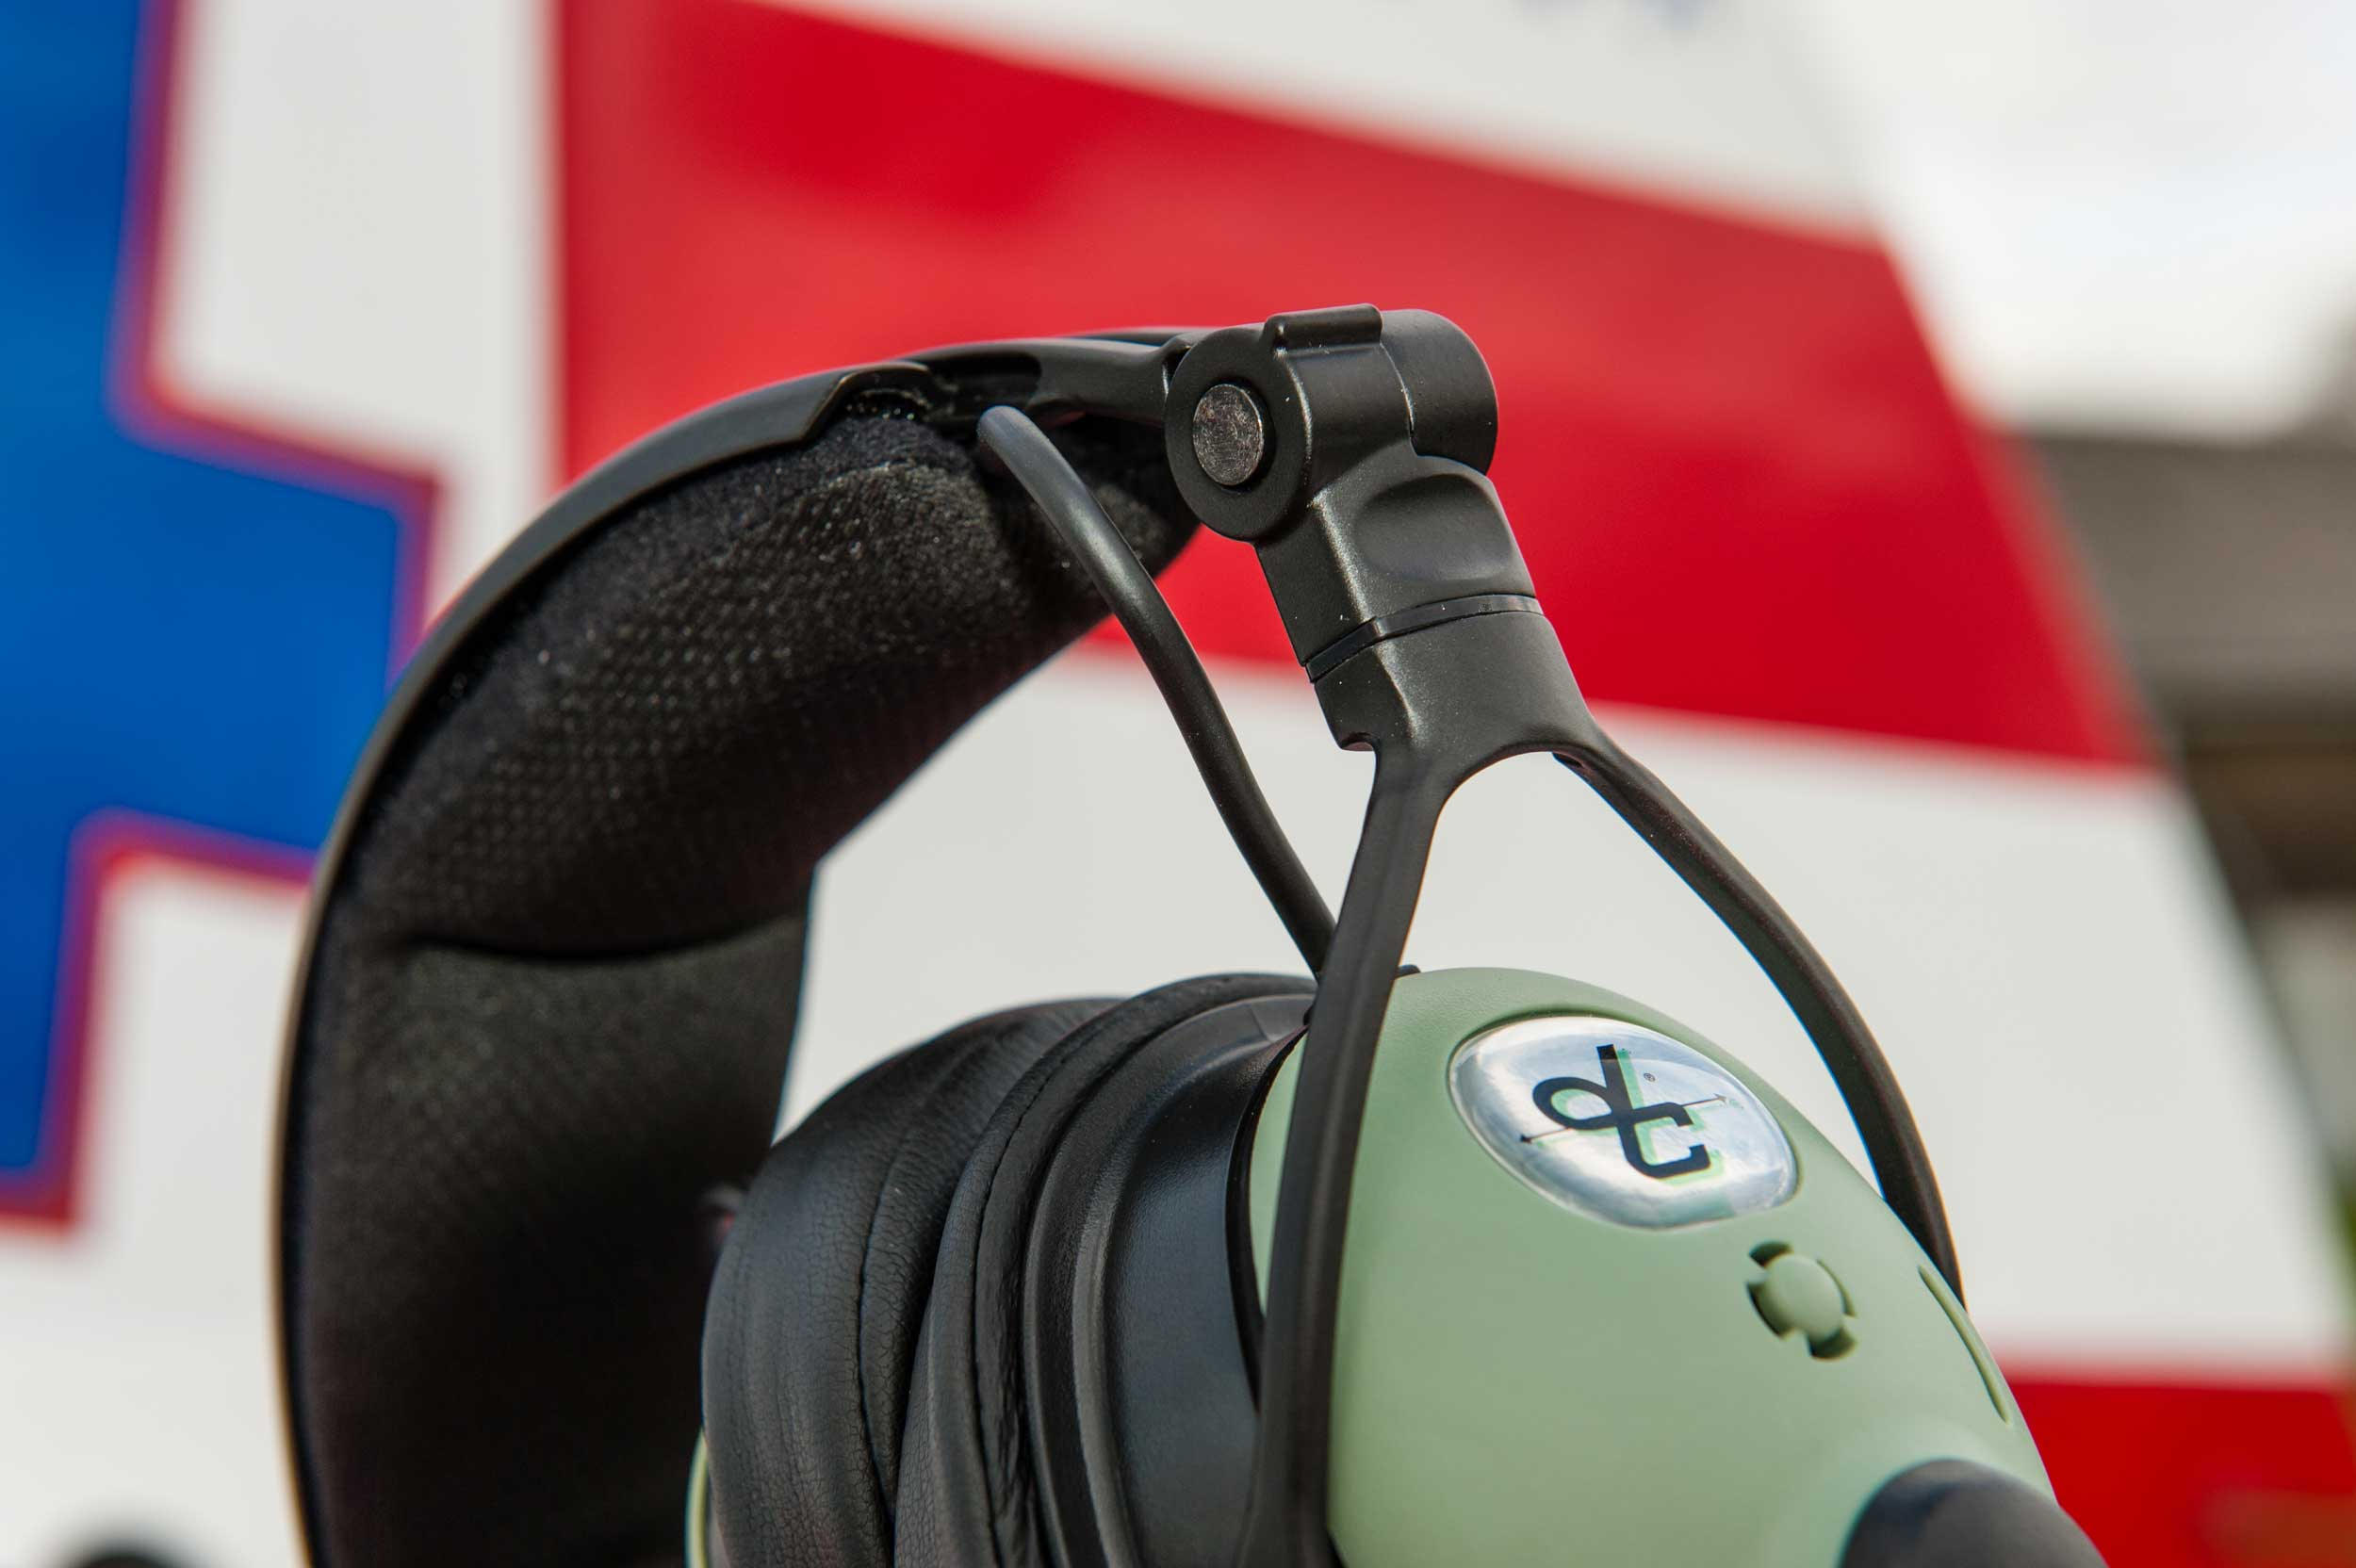 David-Clark-ONE-X-headset-4